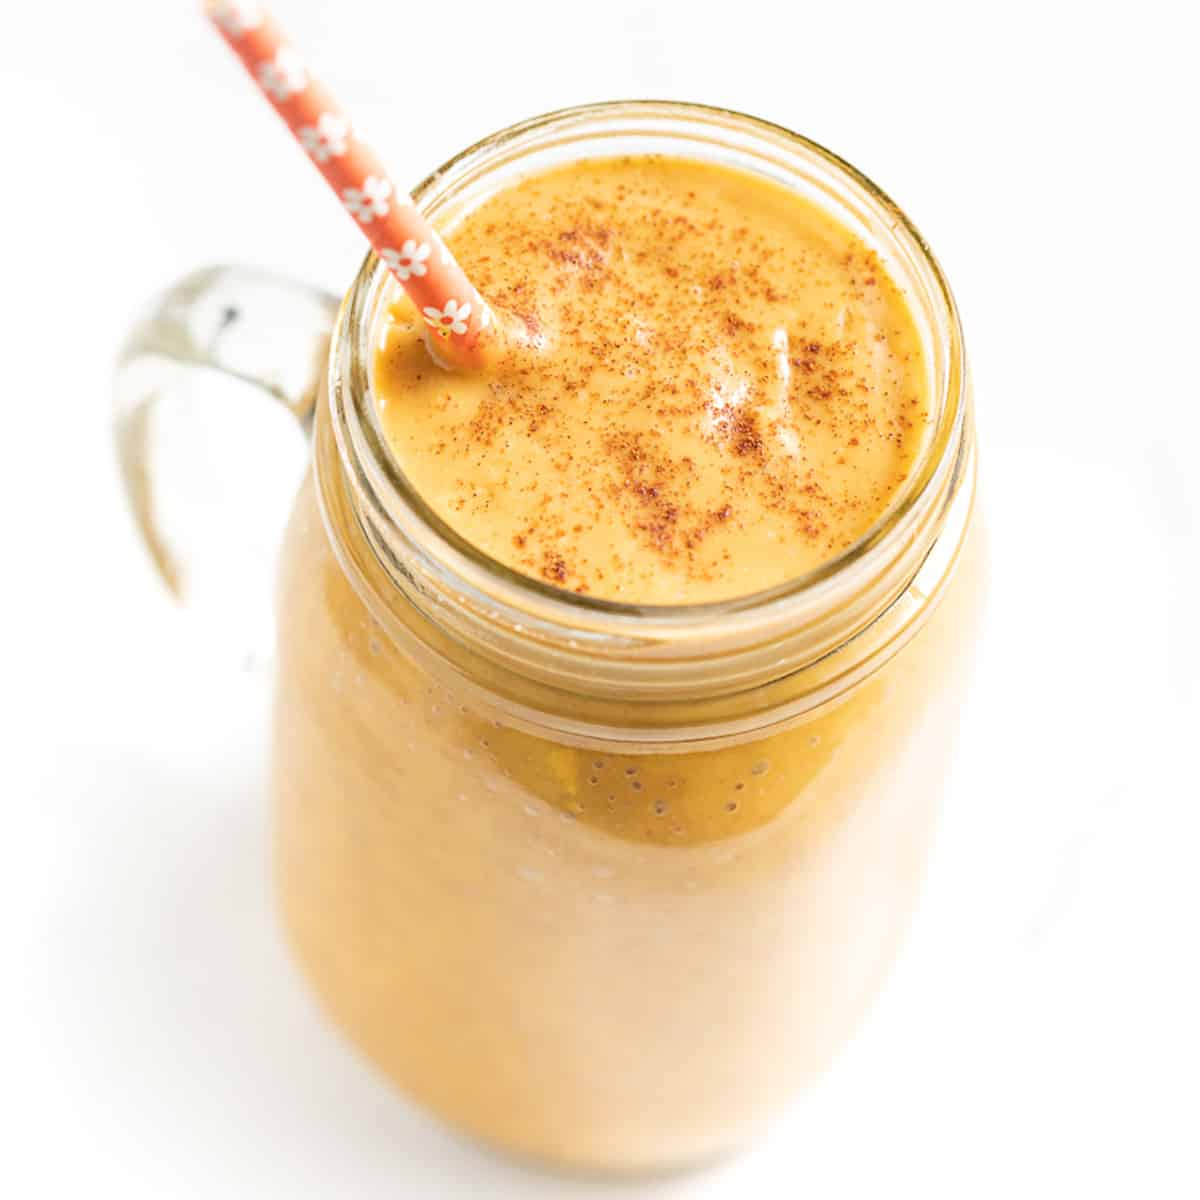 sweet potato smoothie with an orange flowery straw